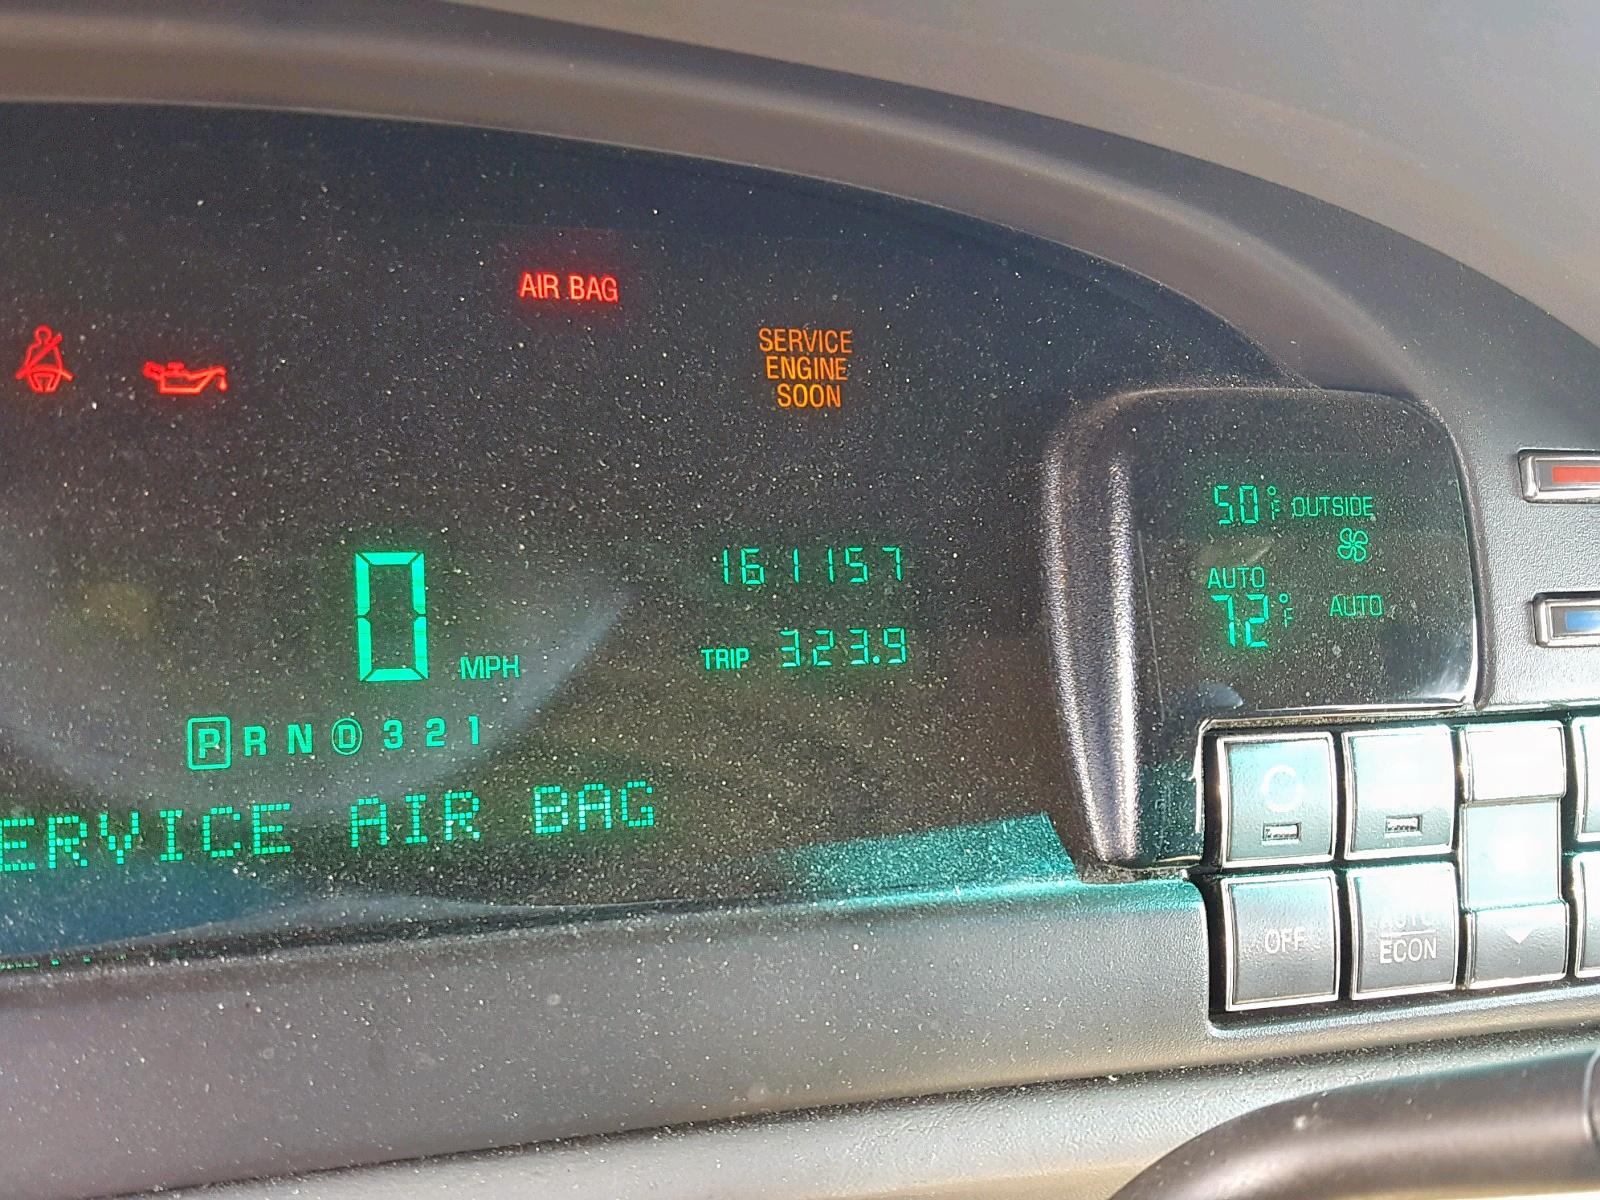 1g6kd54y4xu749397 1999 Cadillac Deville 4 6l Front View